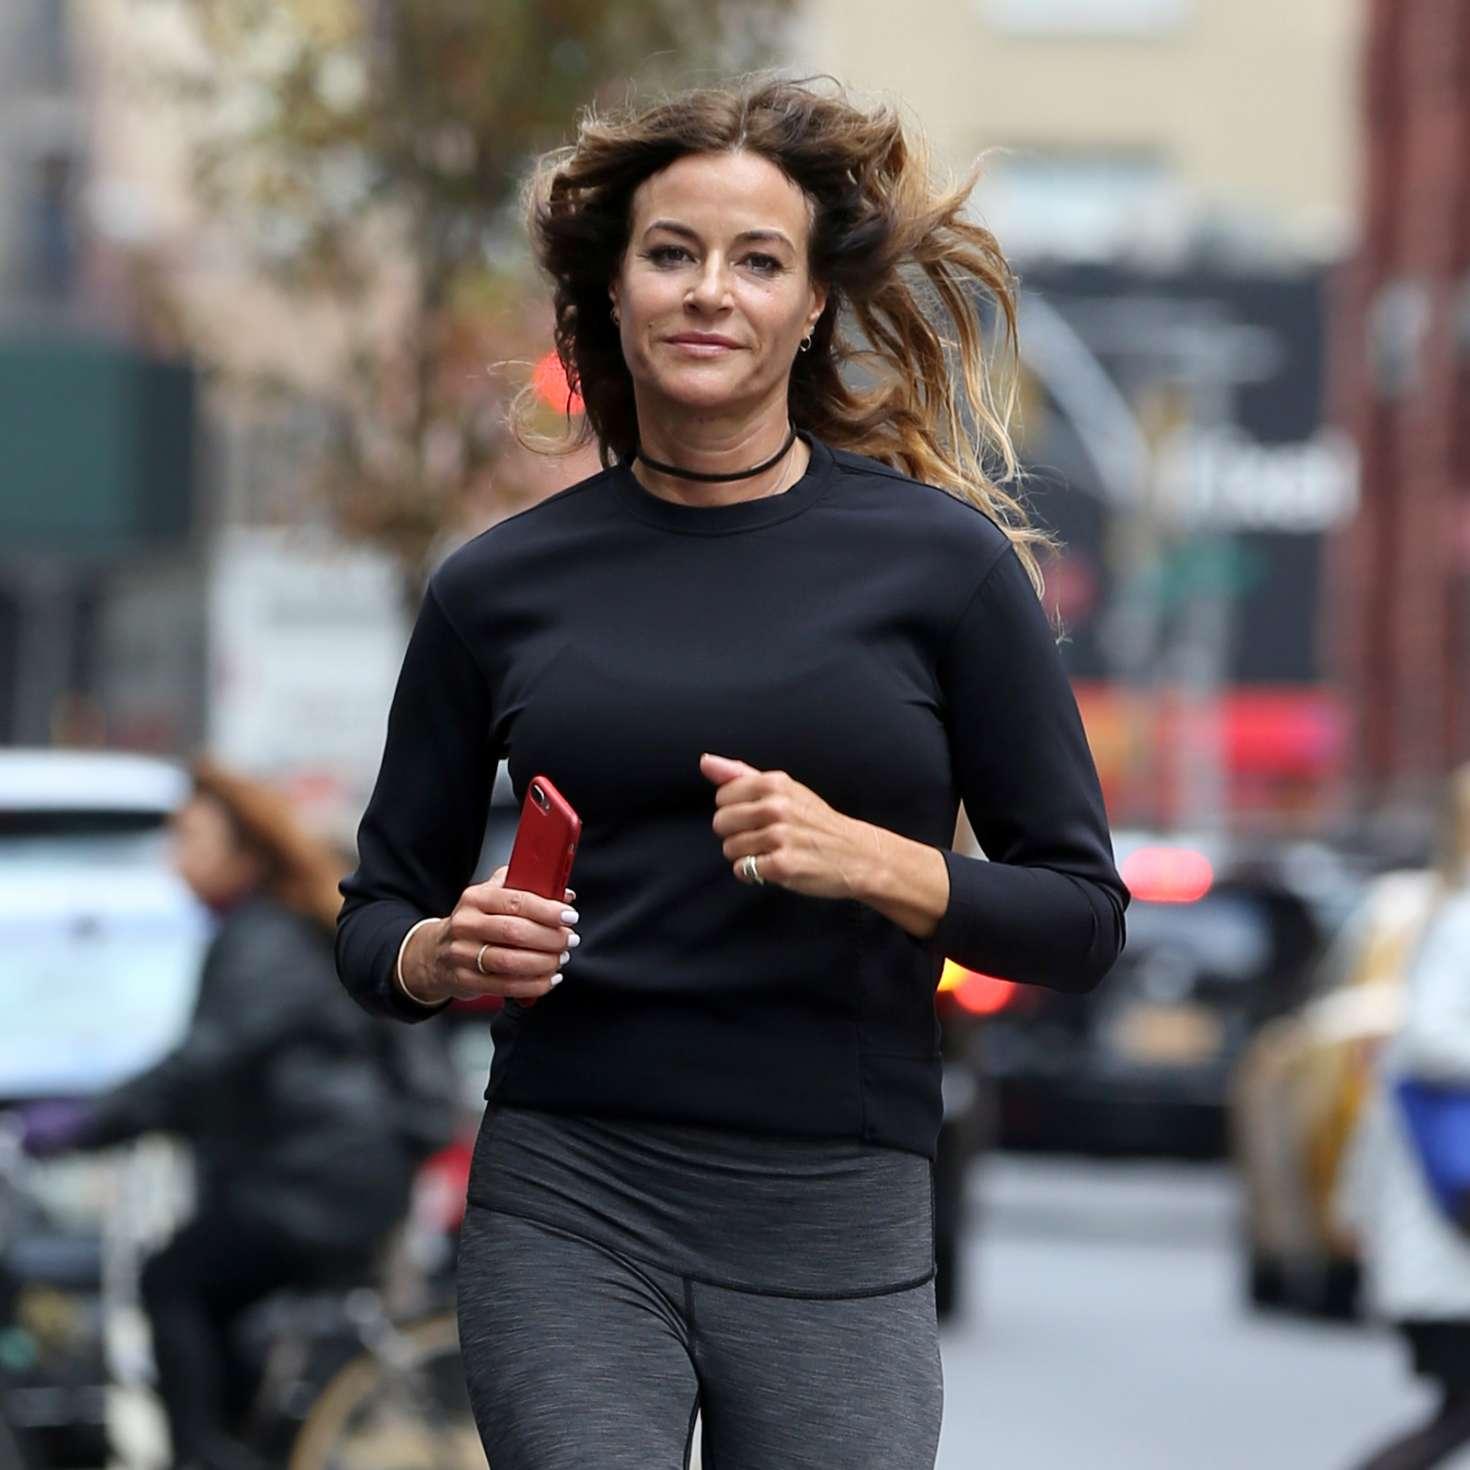 Kelly Bensimon 2017 : Kelly Bensimon: Goes for a jog in NYC -06